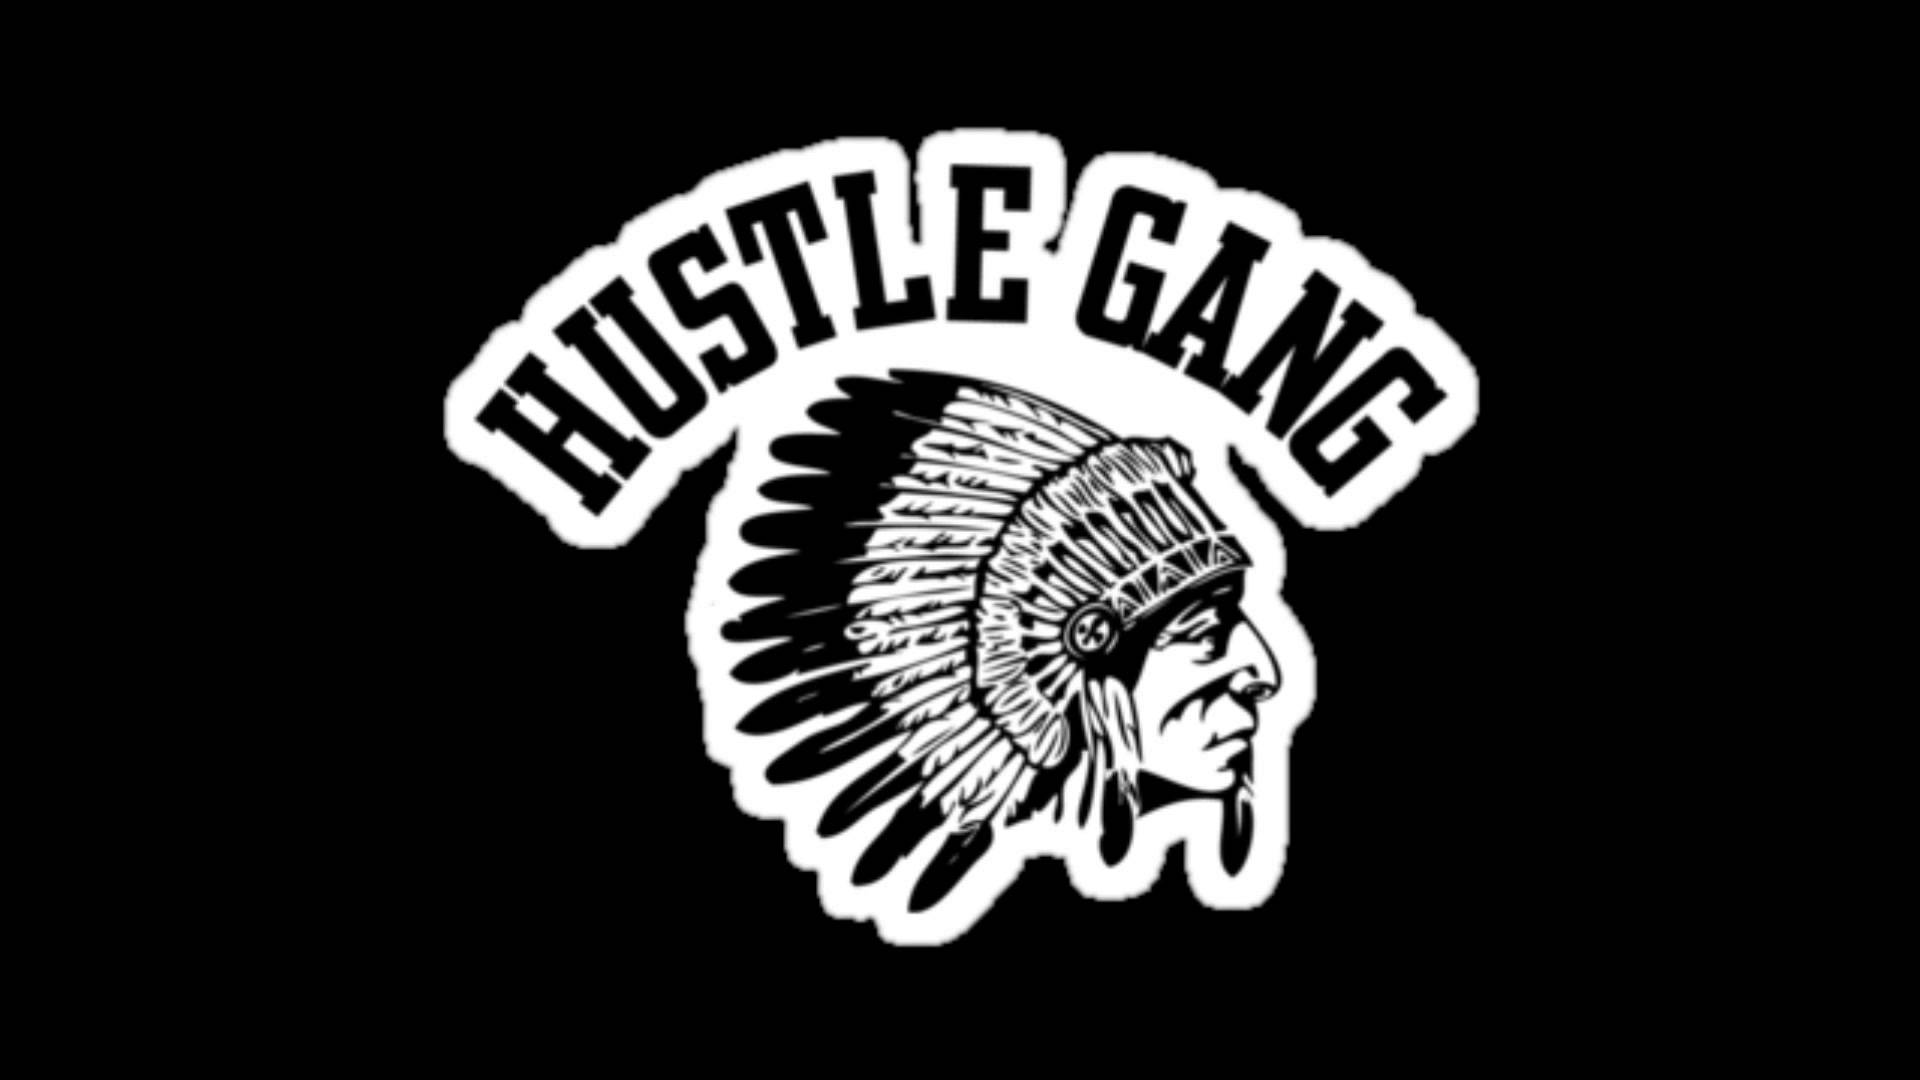 Hustle Gang Logo 1920x1080